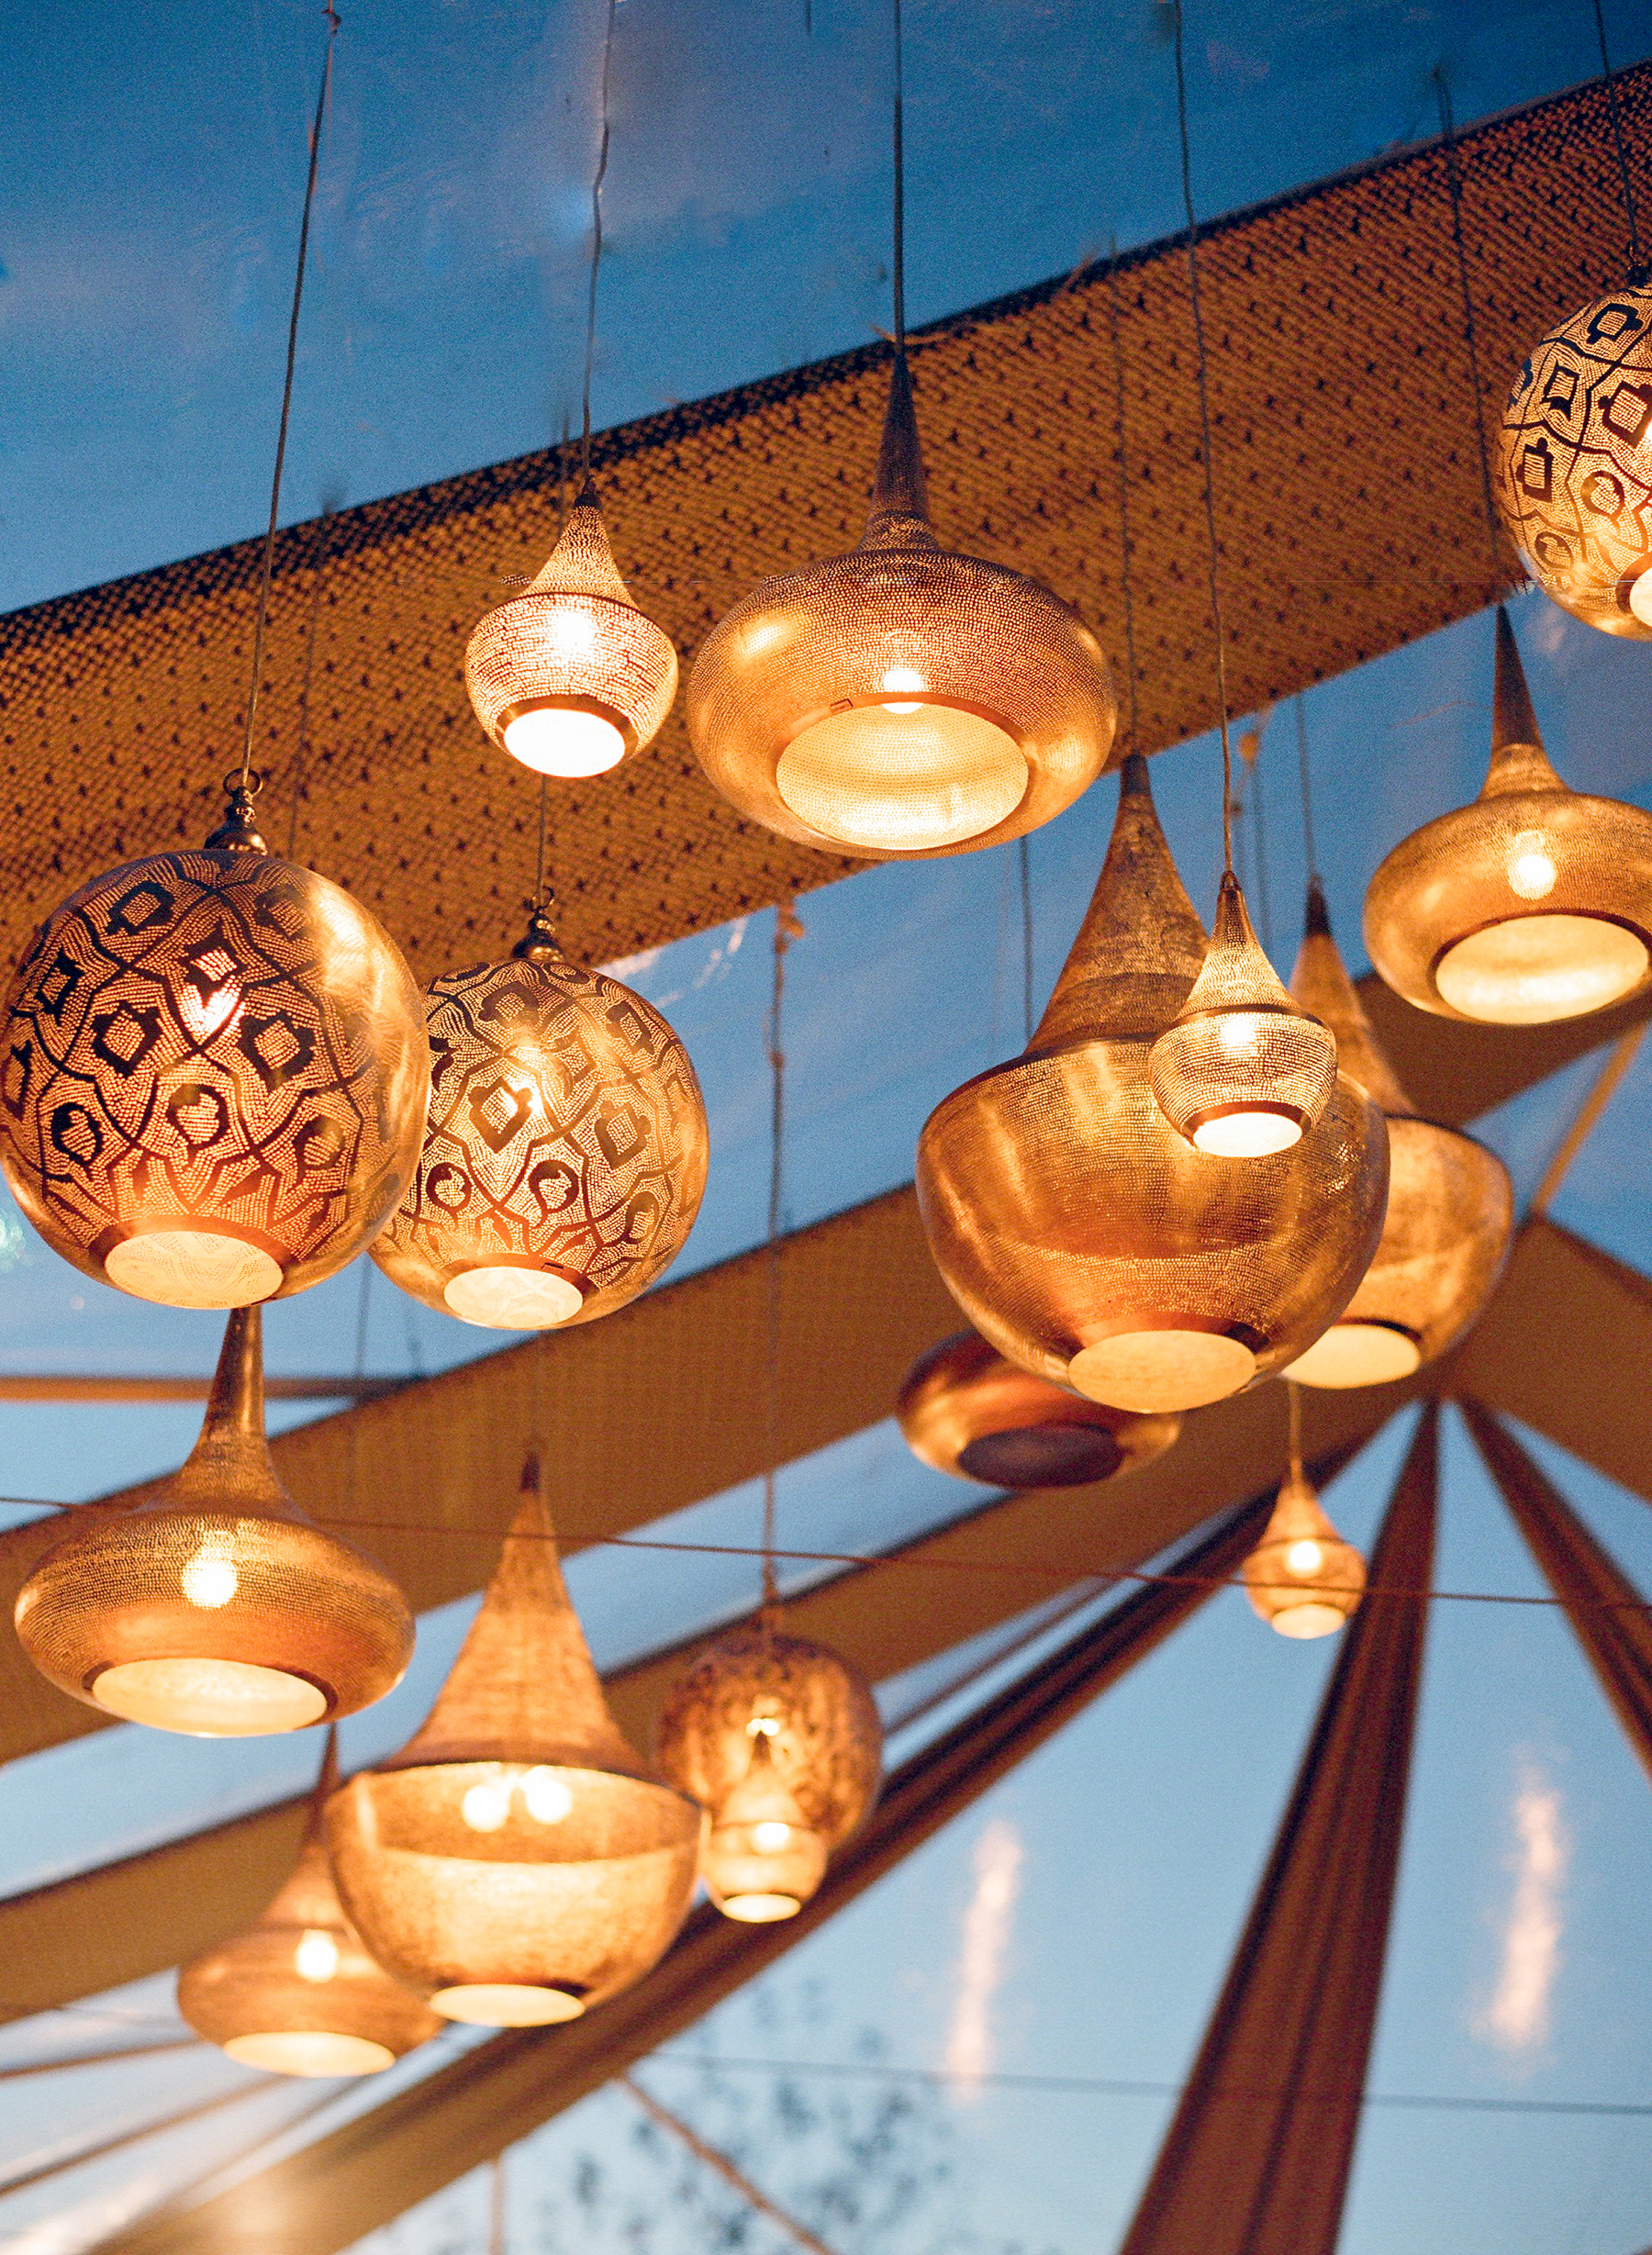 jenna alok welcome party lanterns